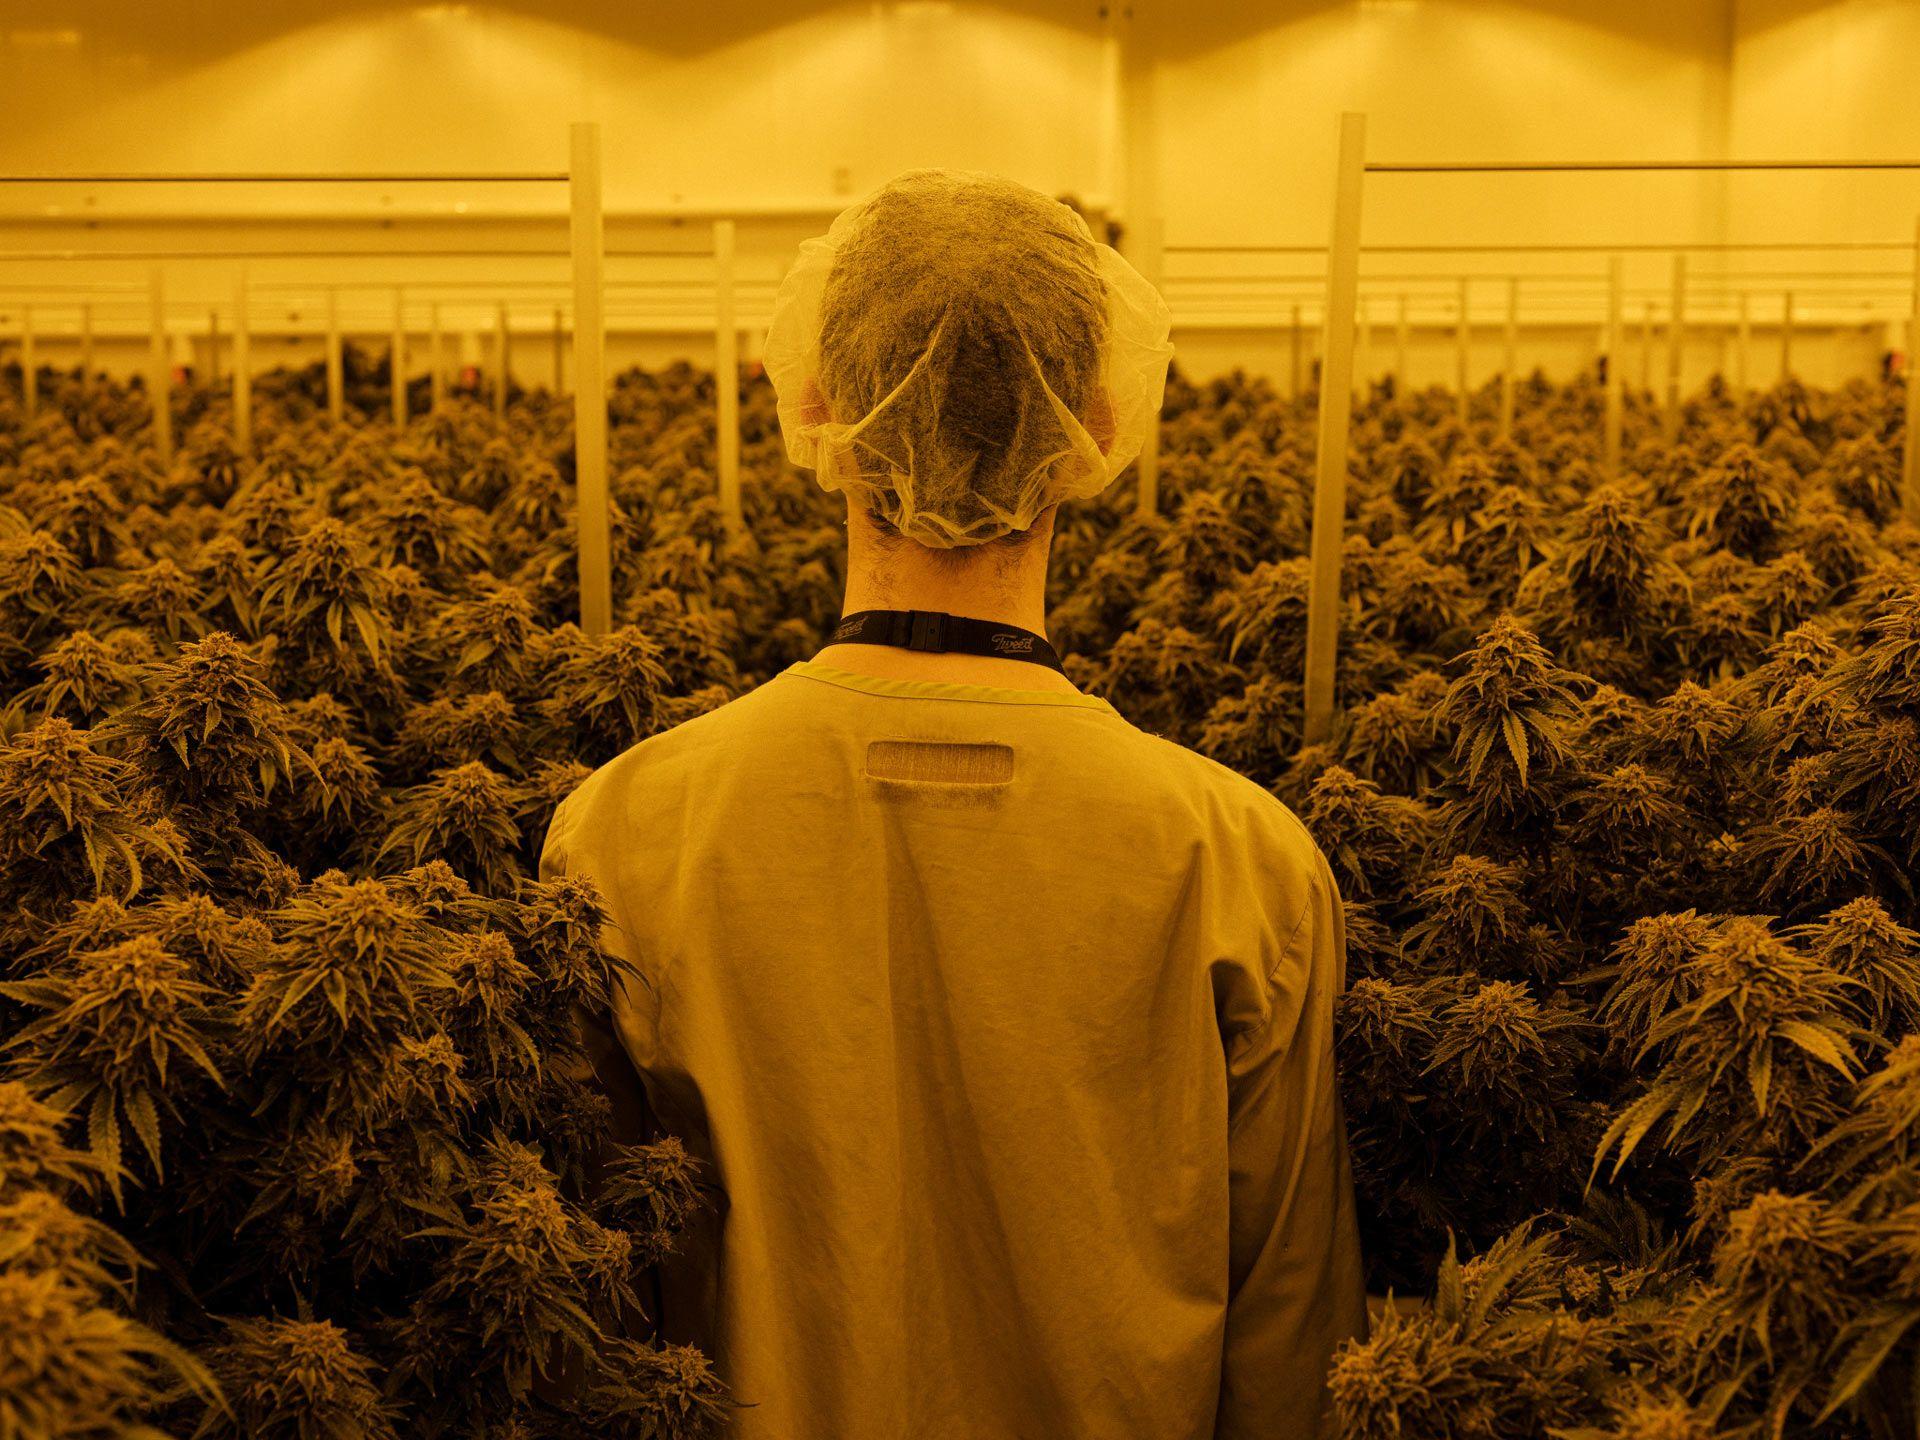 worker passing through field of weed in orange light by Alexi Hobbs at Tweed HQ for Bloomberg Businessweek